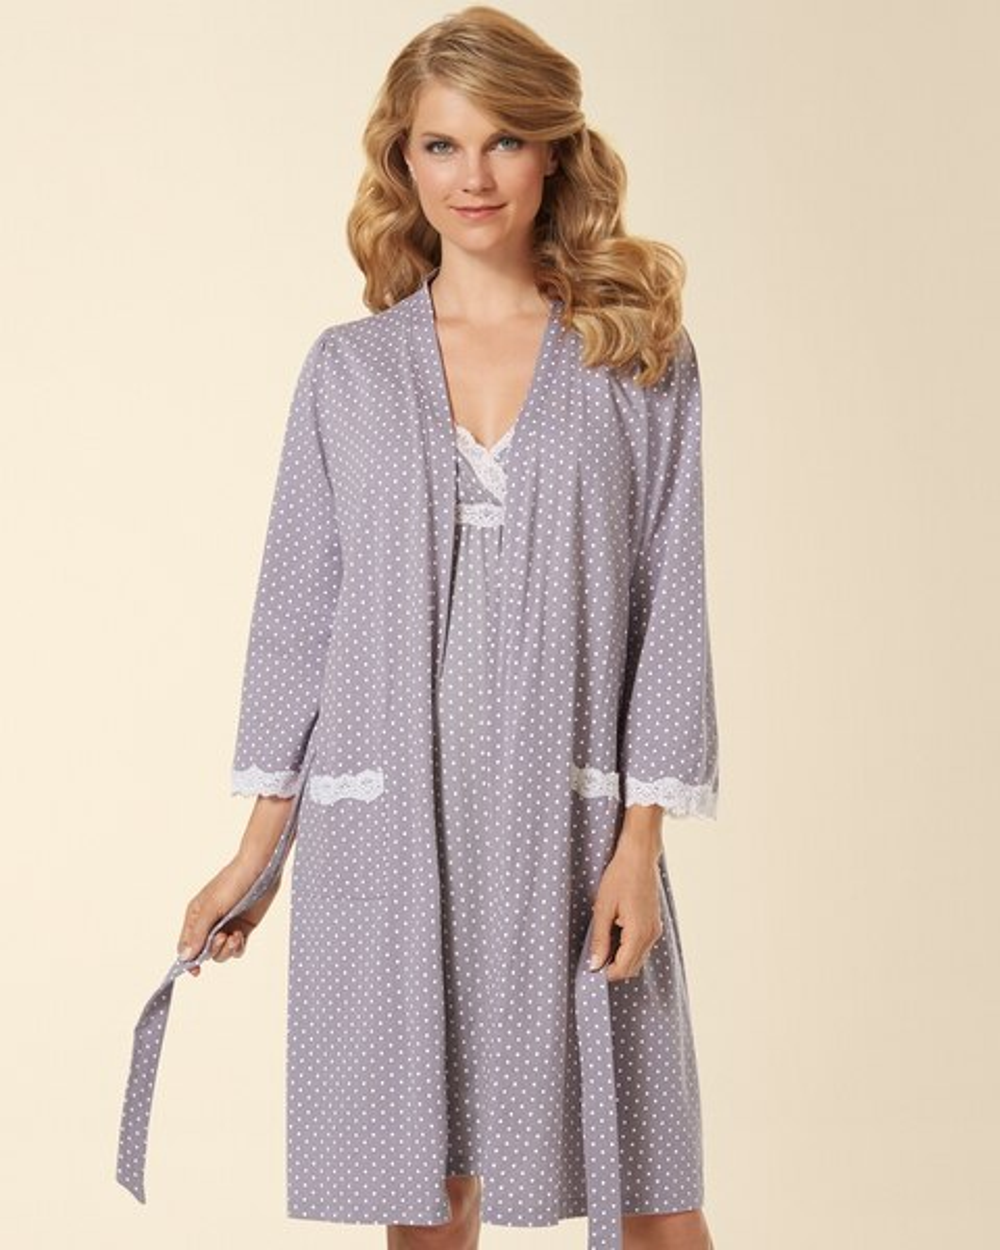 45746a028455d Return to thumbnail image selection Belabumbum Cotton Nursing Sleep Chemise Grey  Dot